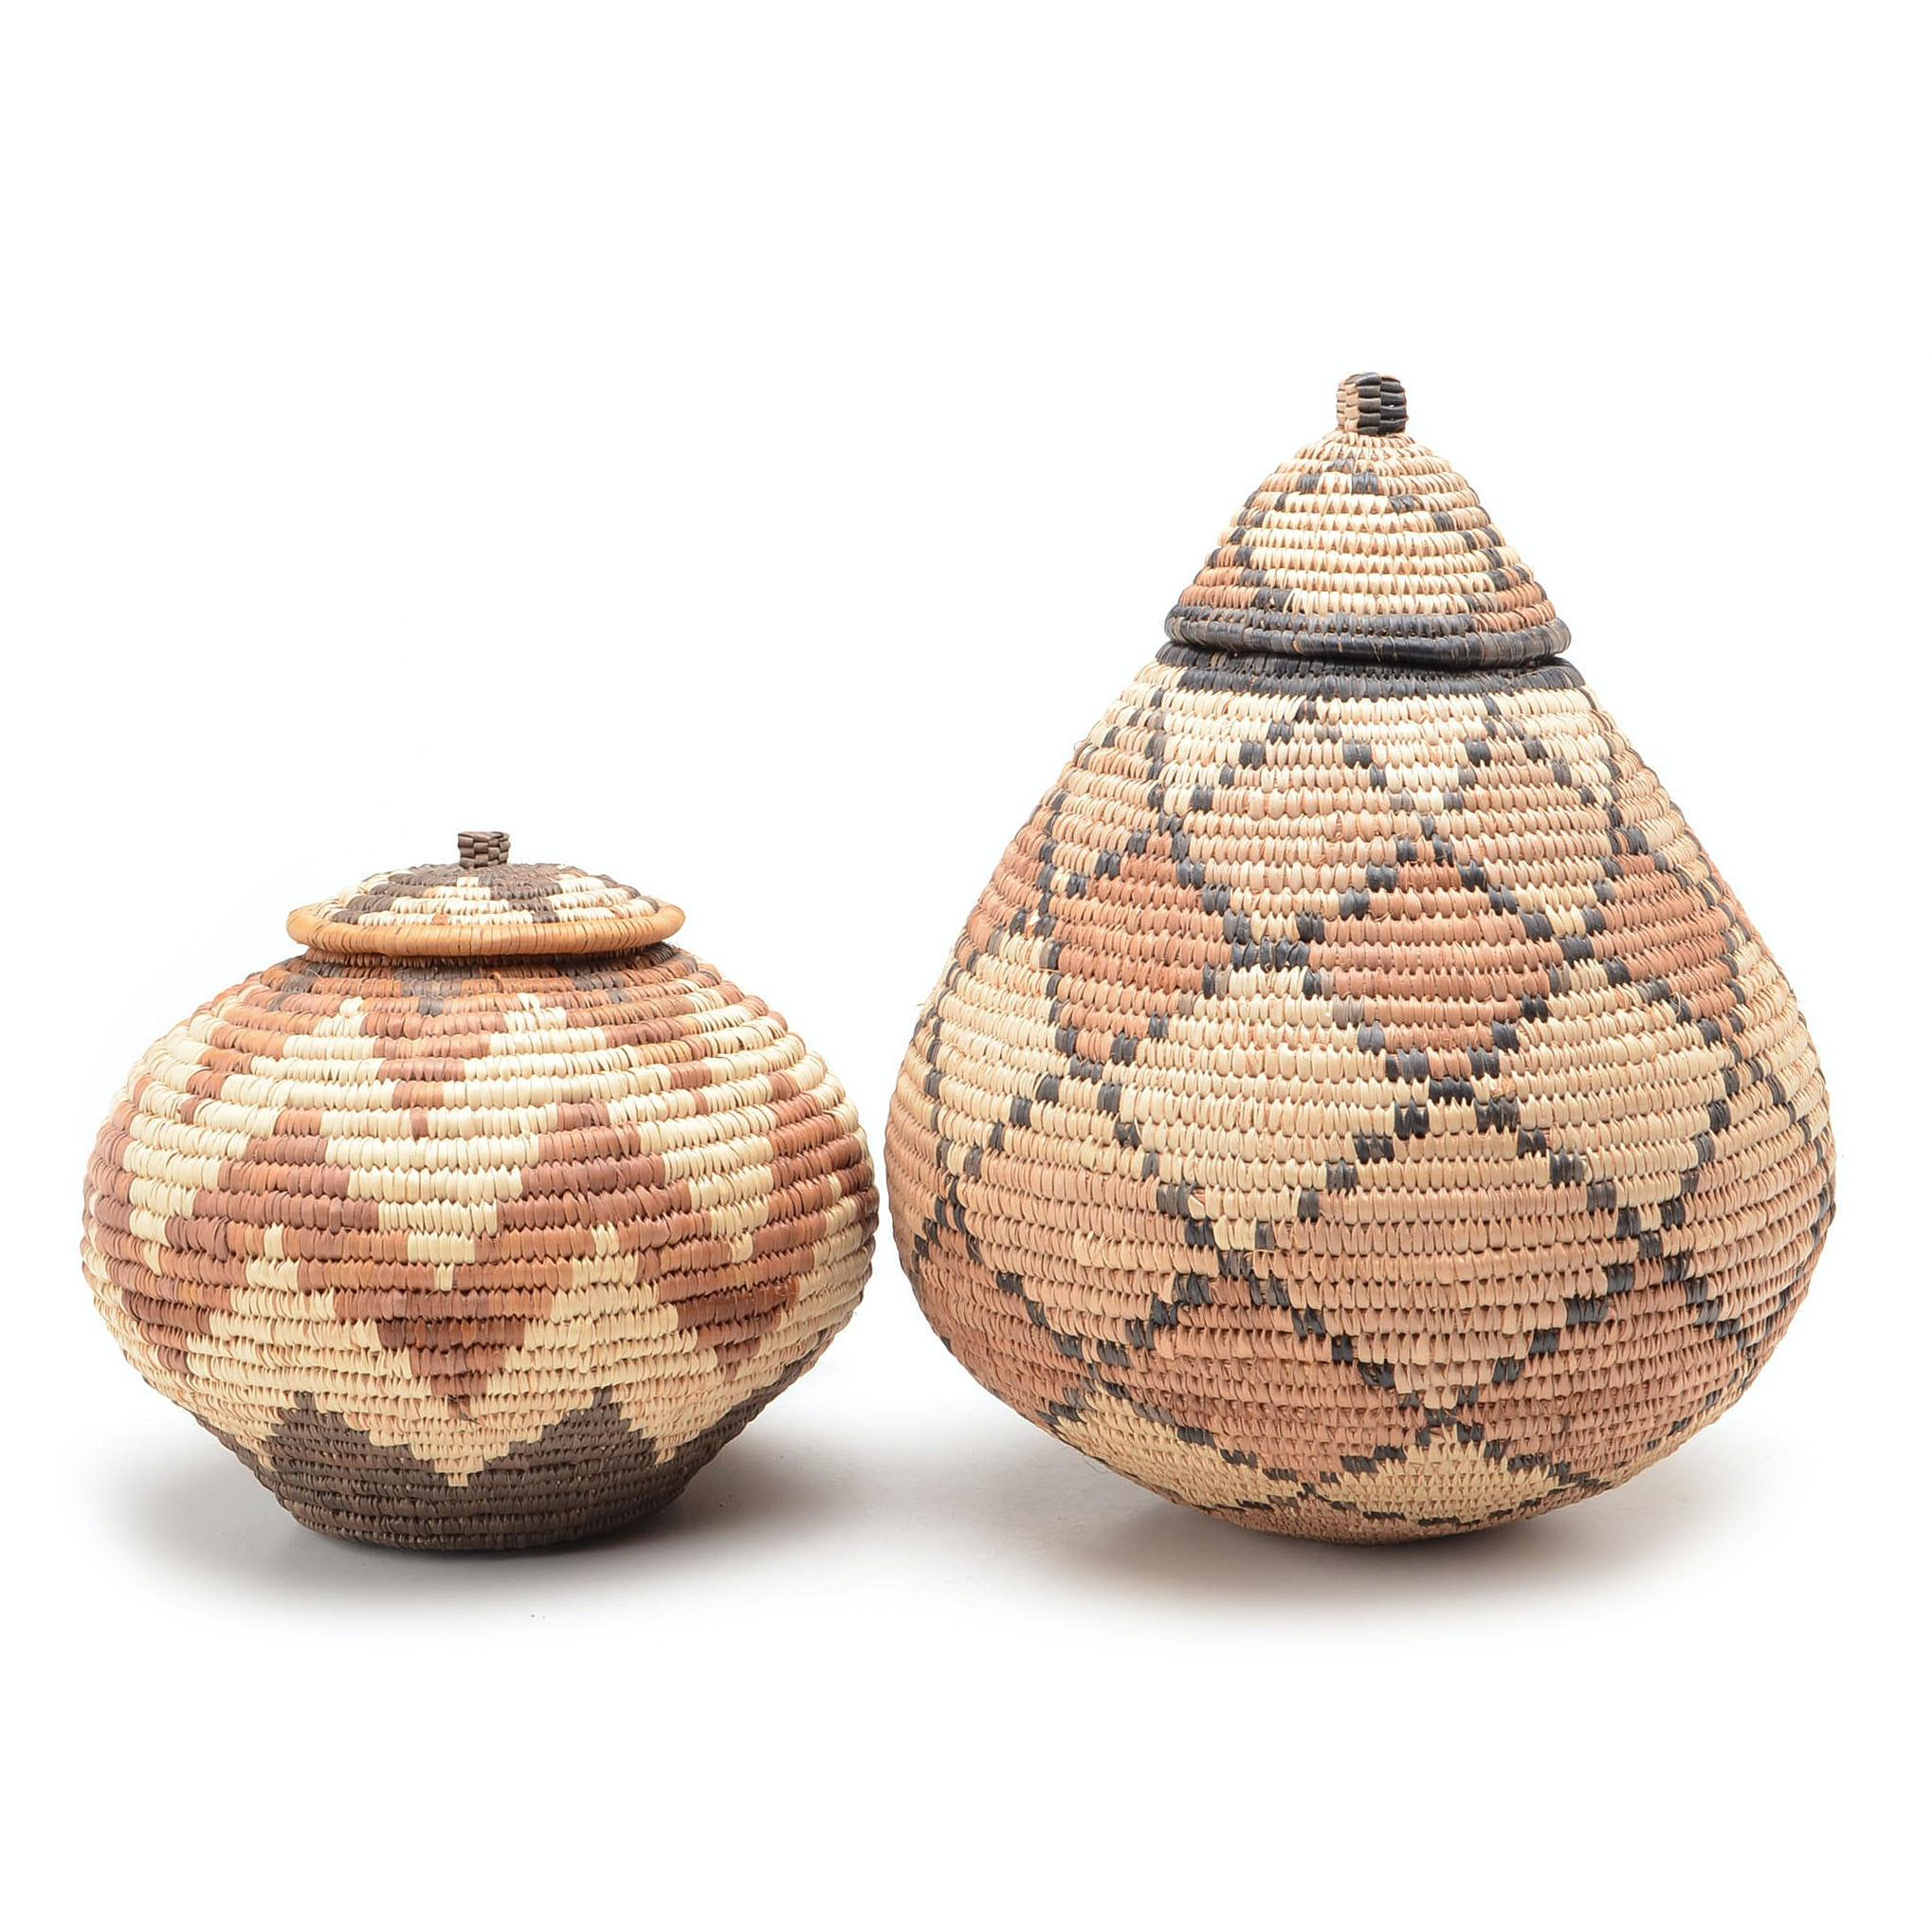 Two Handwoven Zulu Ukhamba Baskets